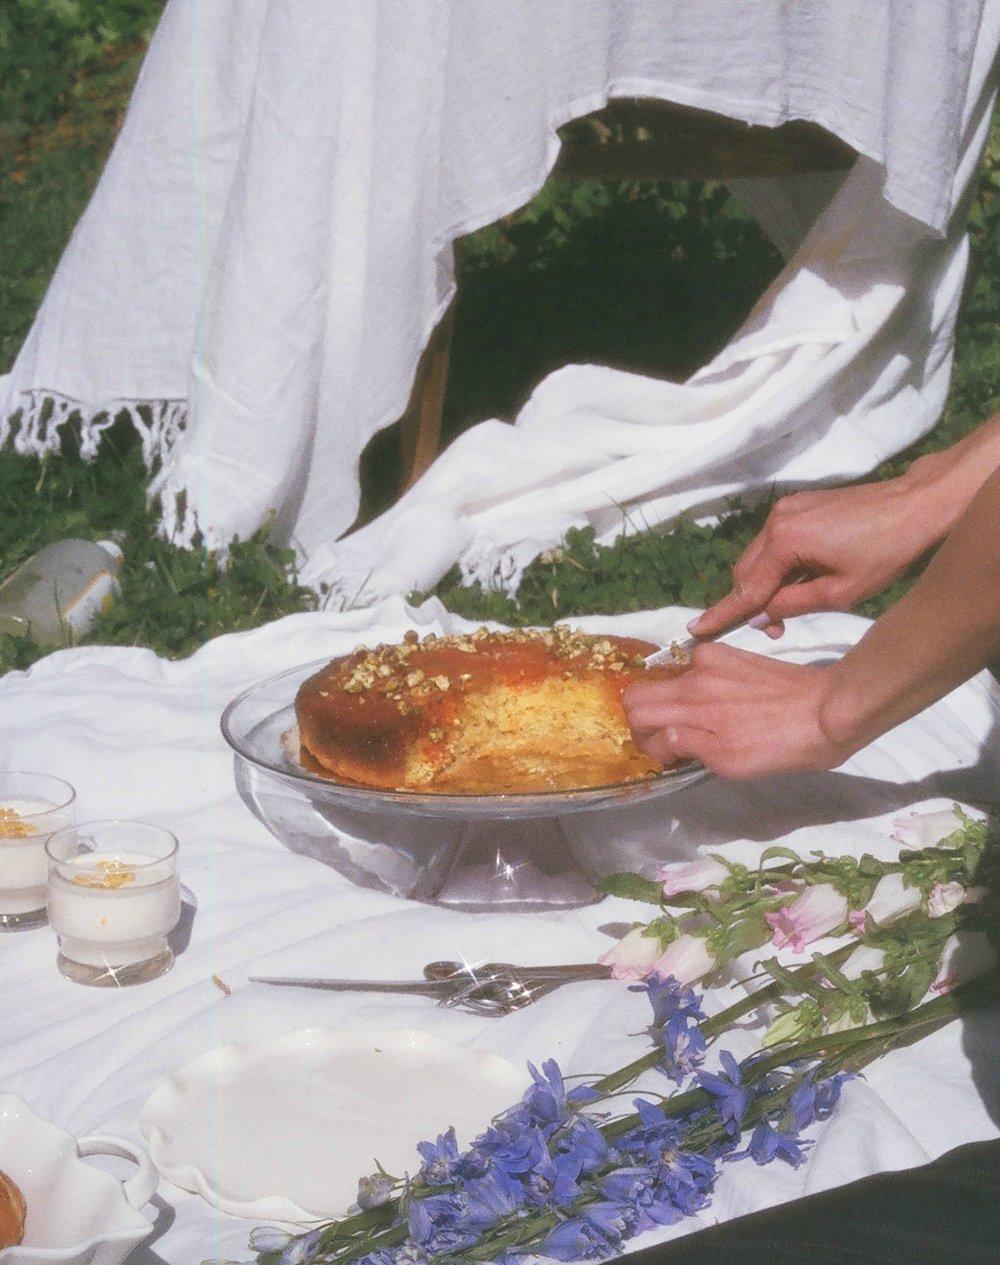 foodpic1.jpg